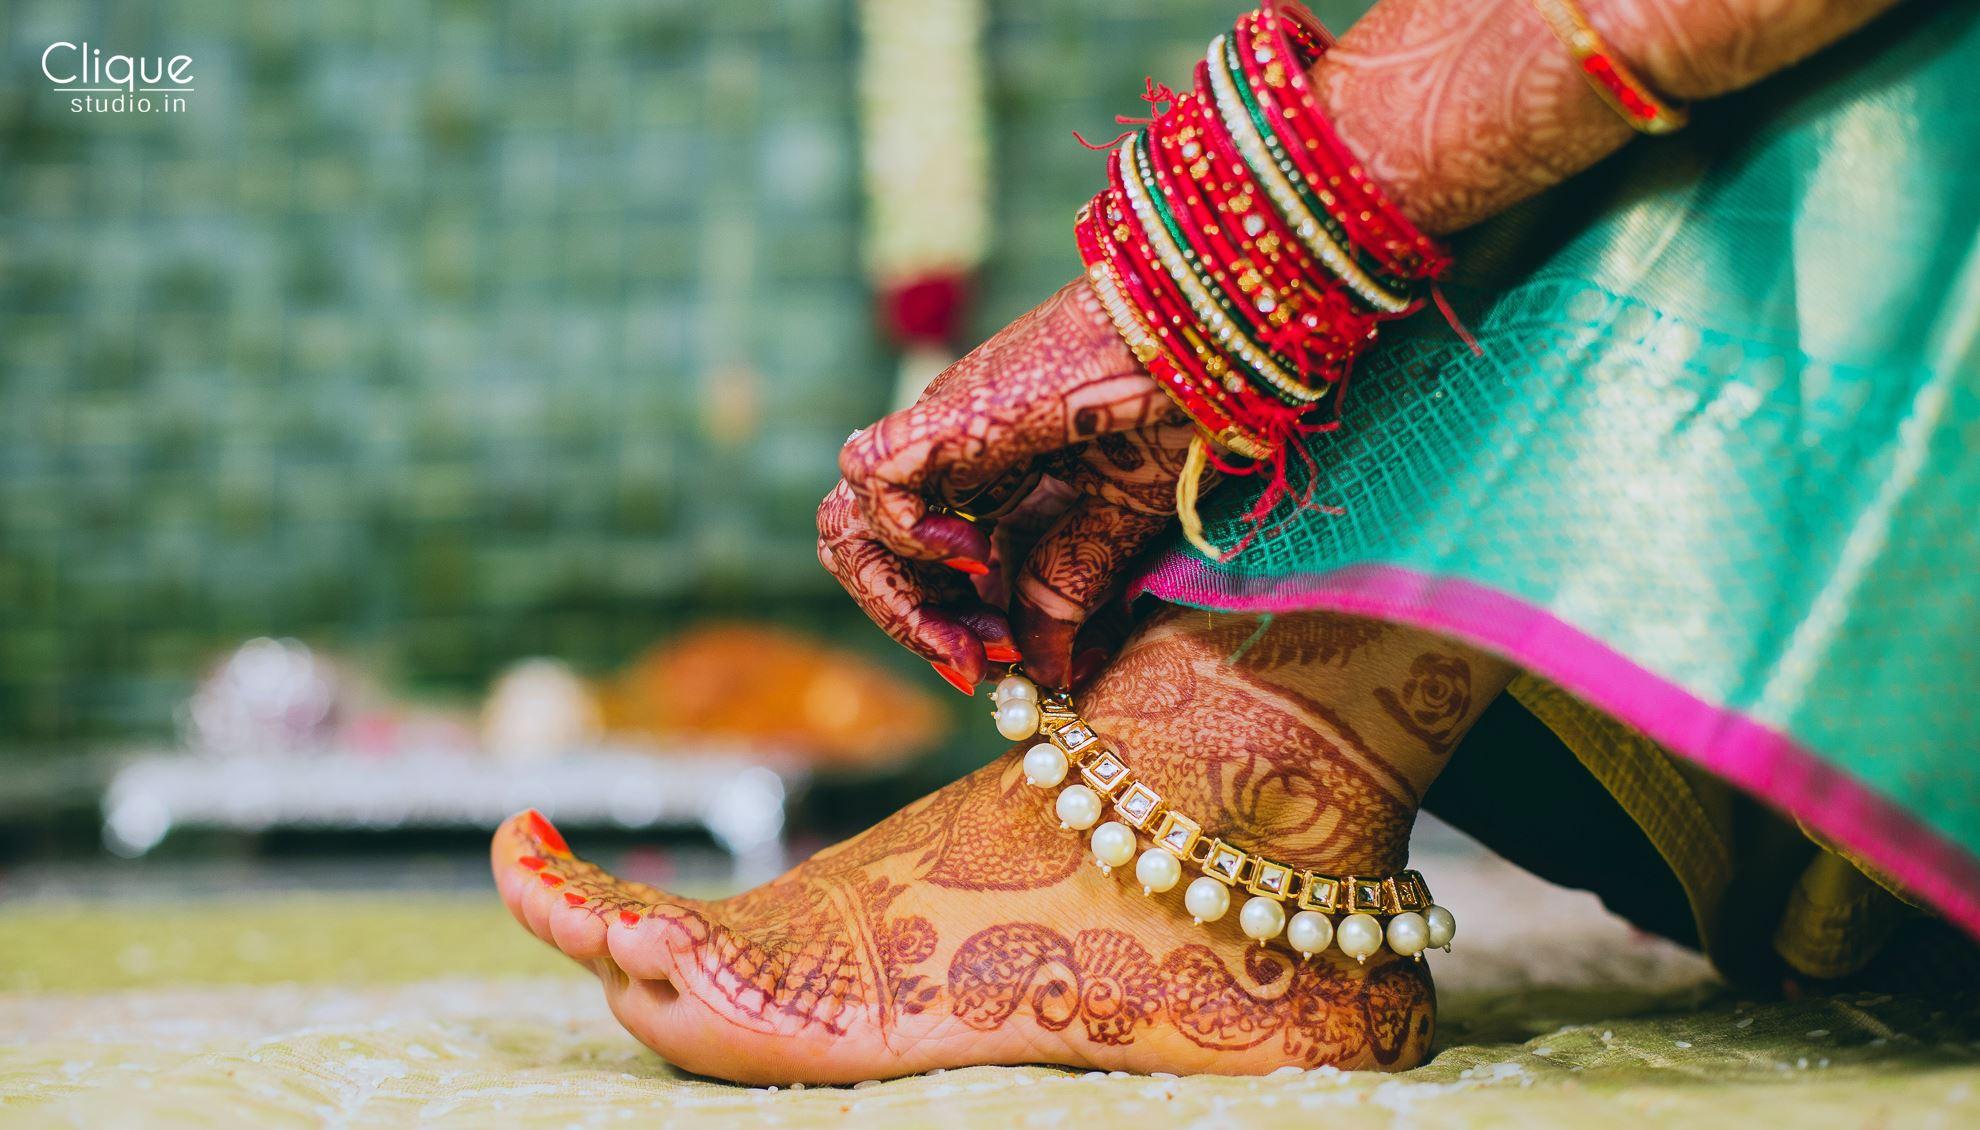 PunjabKesari,Trendy Payal Designs For Brides, ट्रेंडी पायल डिज़ाइन फॉर ब्राइड्स